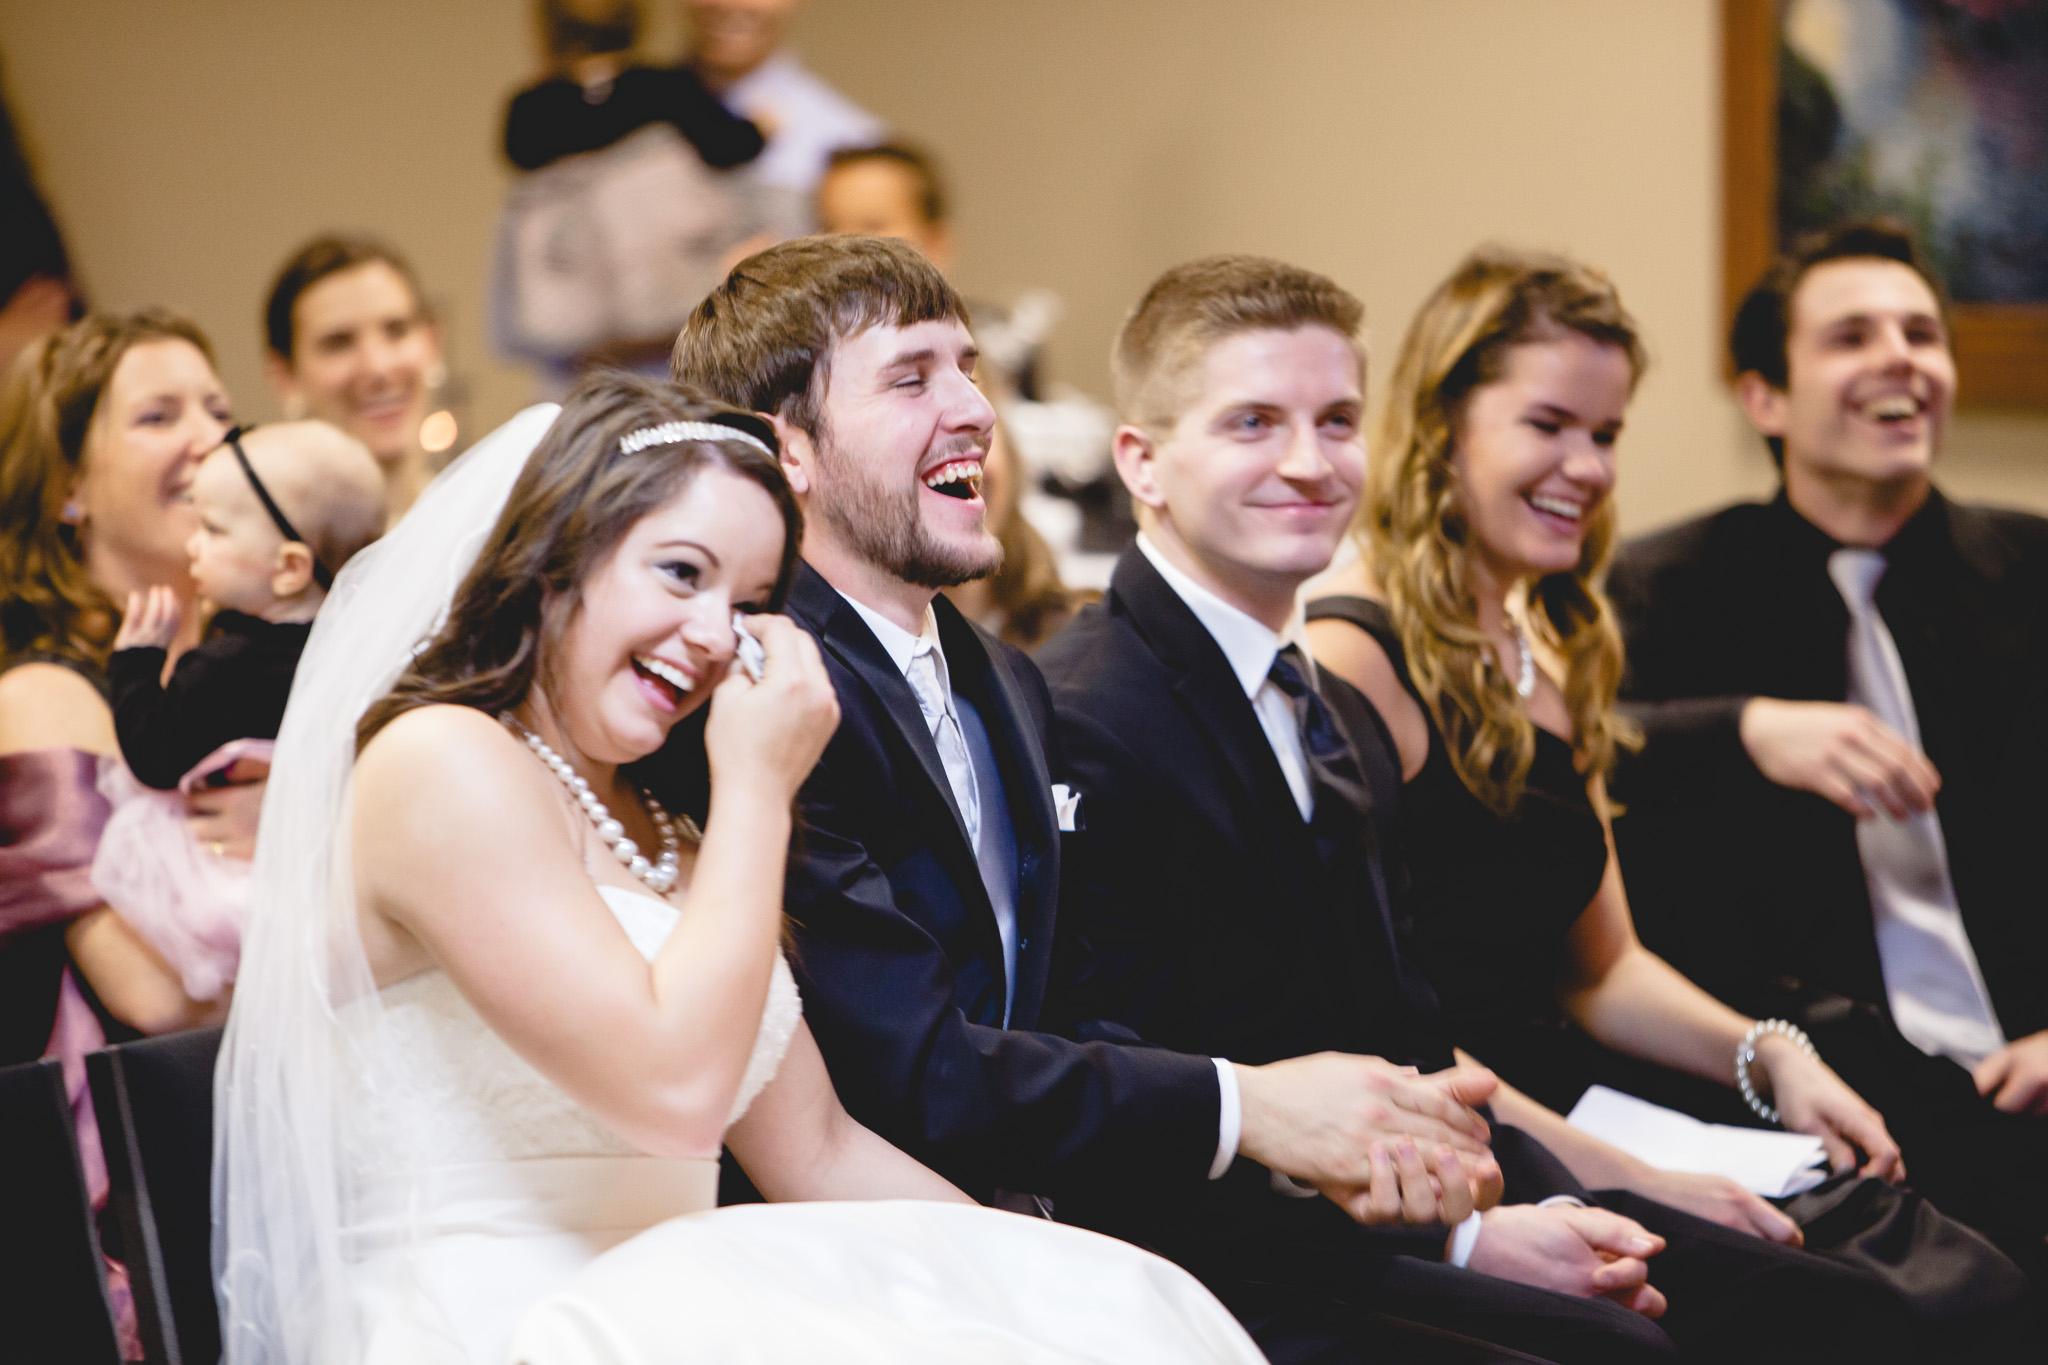 277-Jonathan-Kuhn-Photography-Victoria-Brandon-Wedding-WEB-1455.jpg